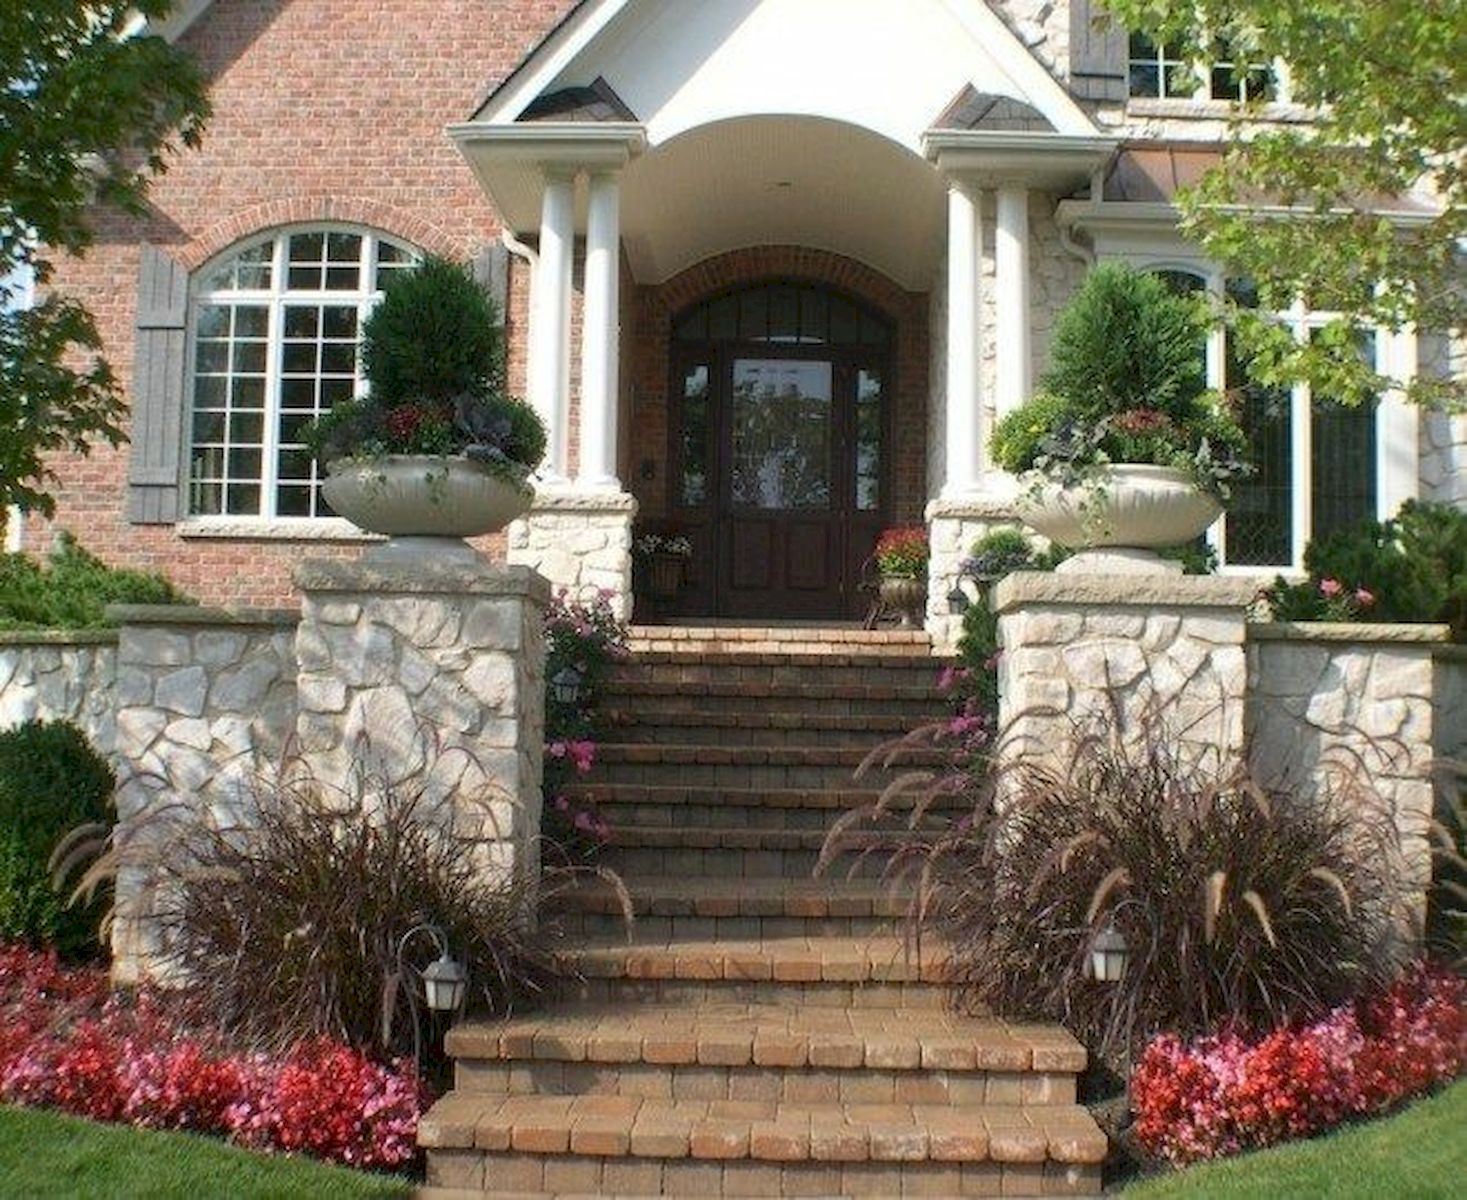 70 Stunning Exterior House Design Ideas (27)